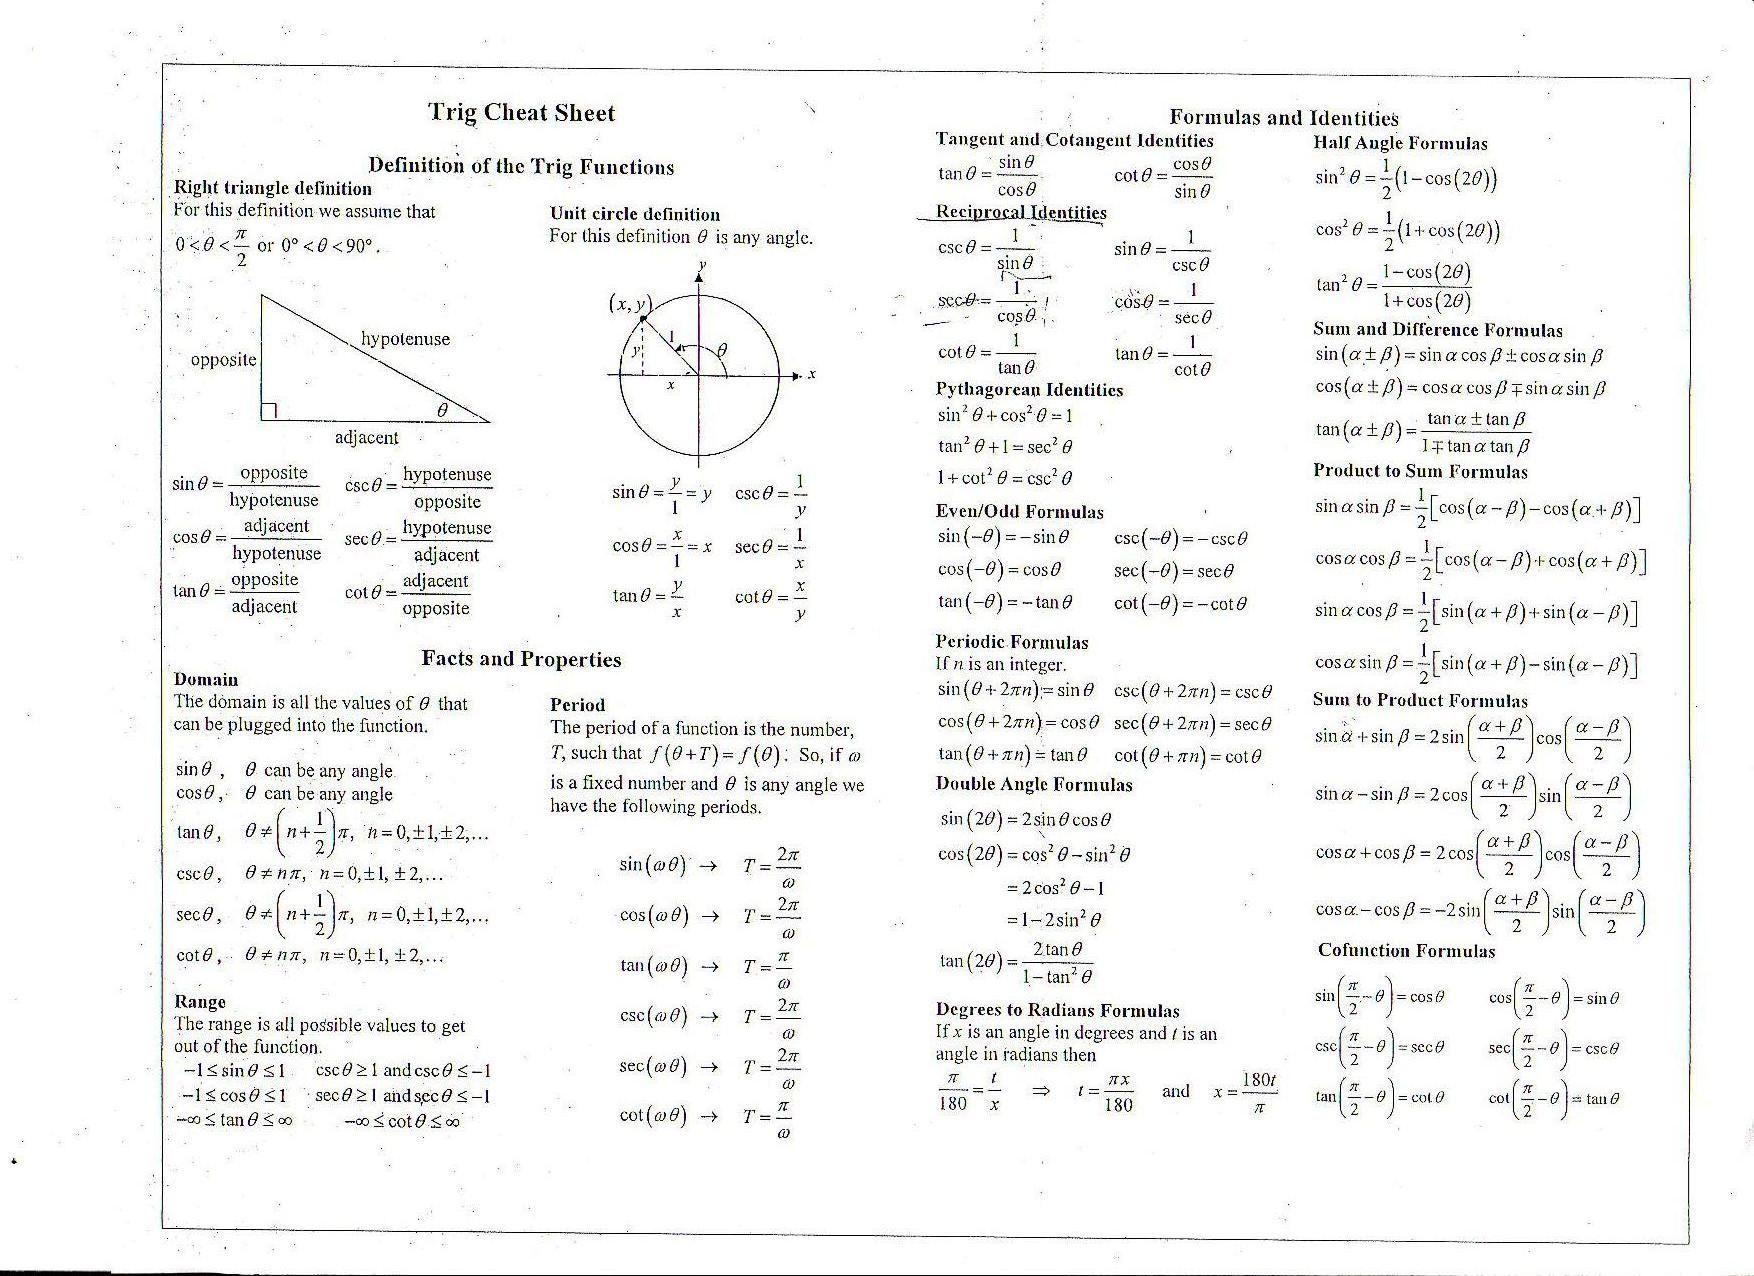 33 Proving Trigonometric Identities Worksheet With Answers